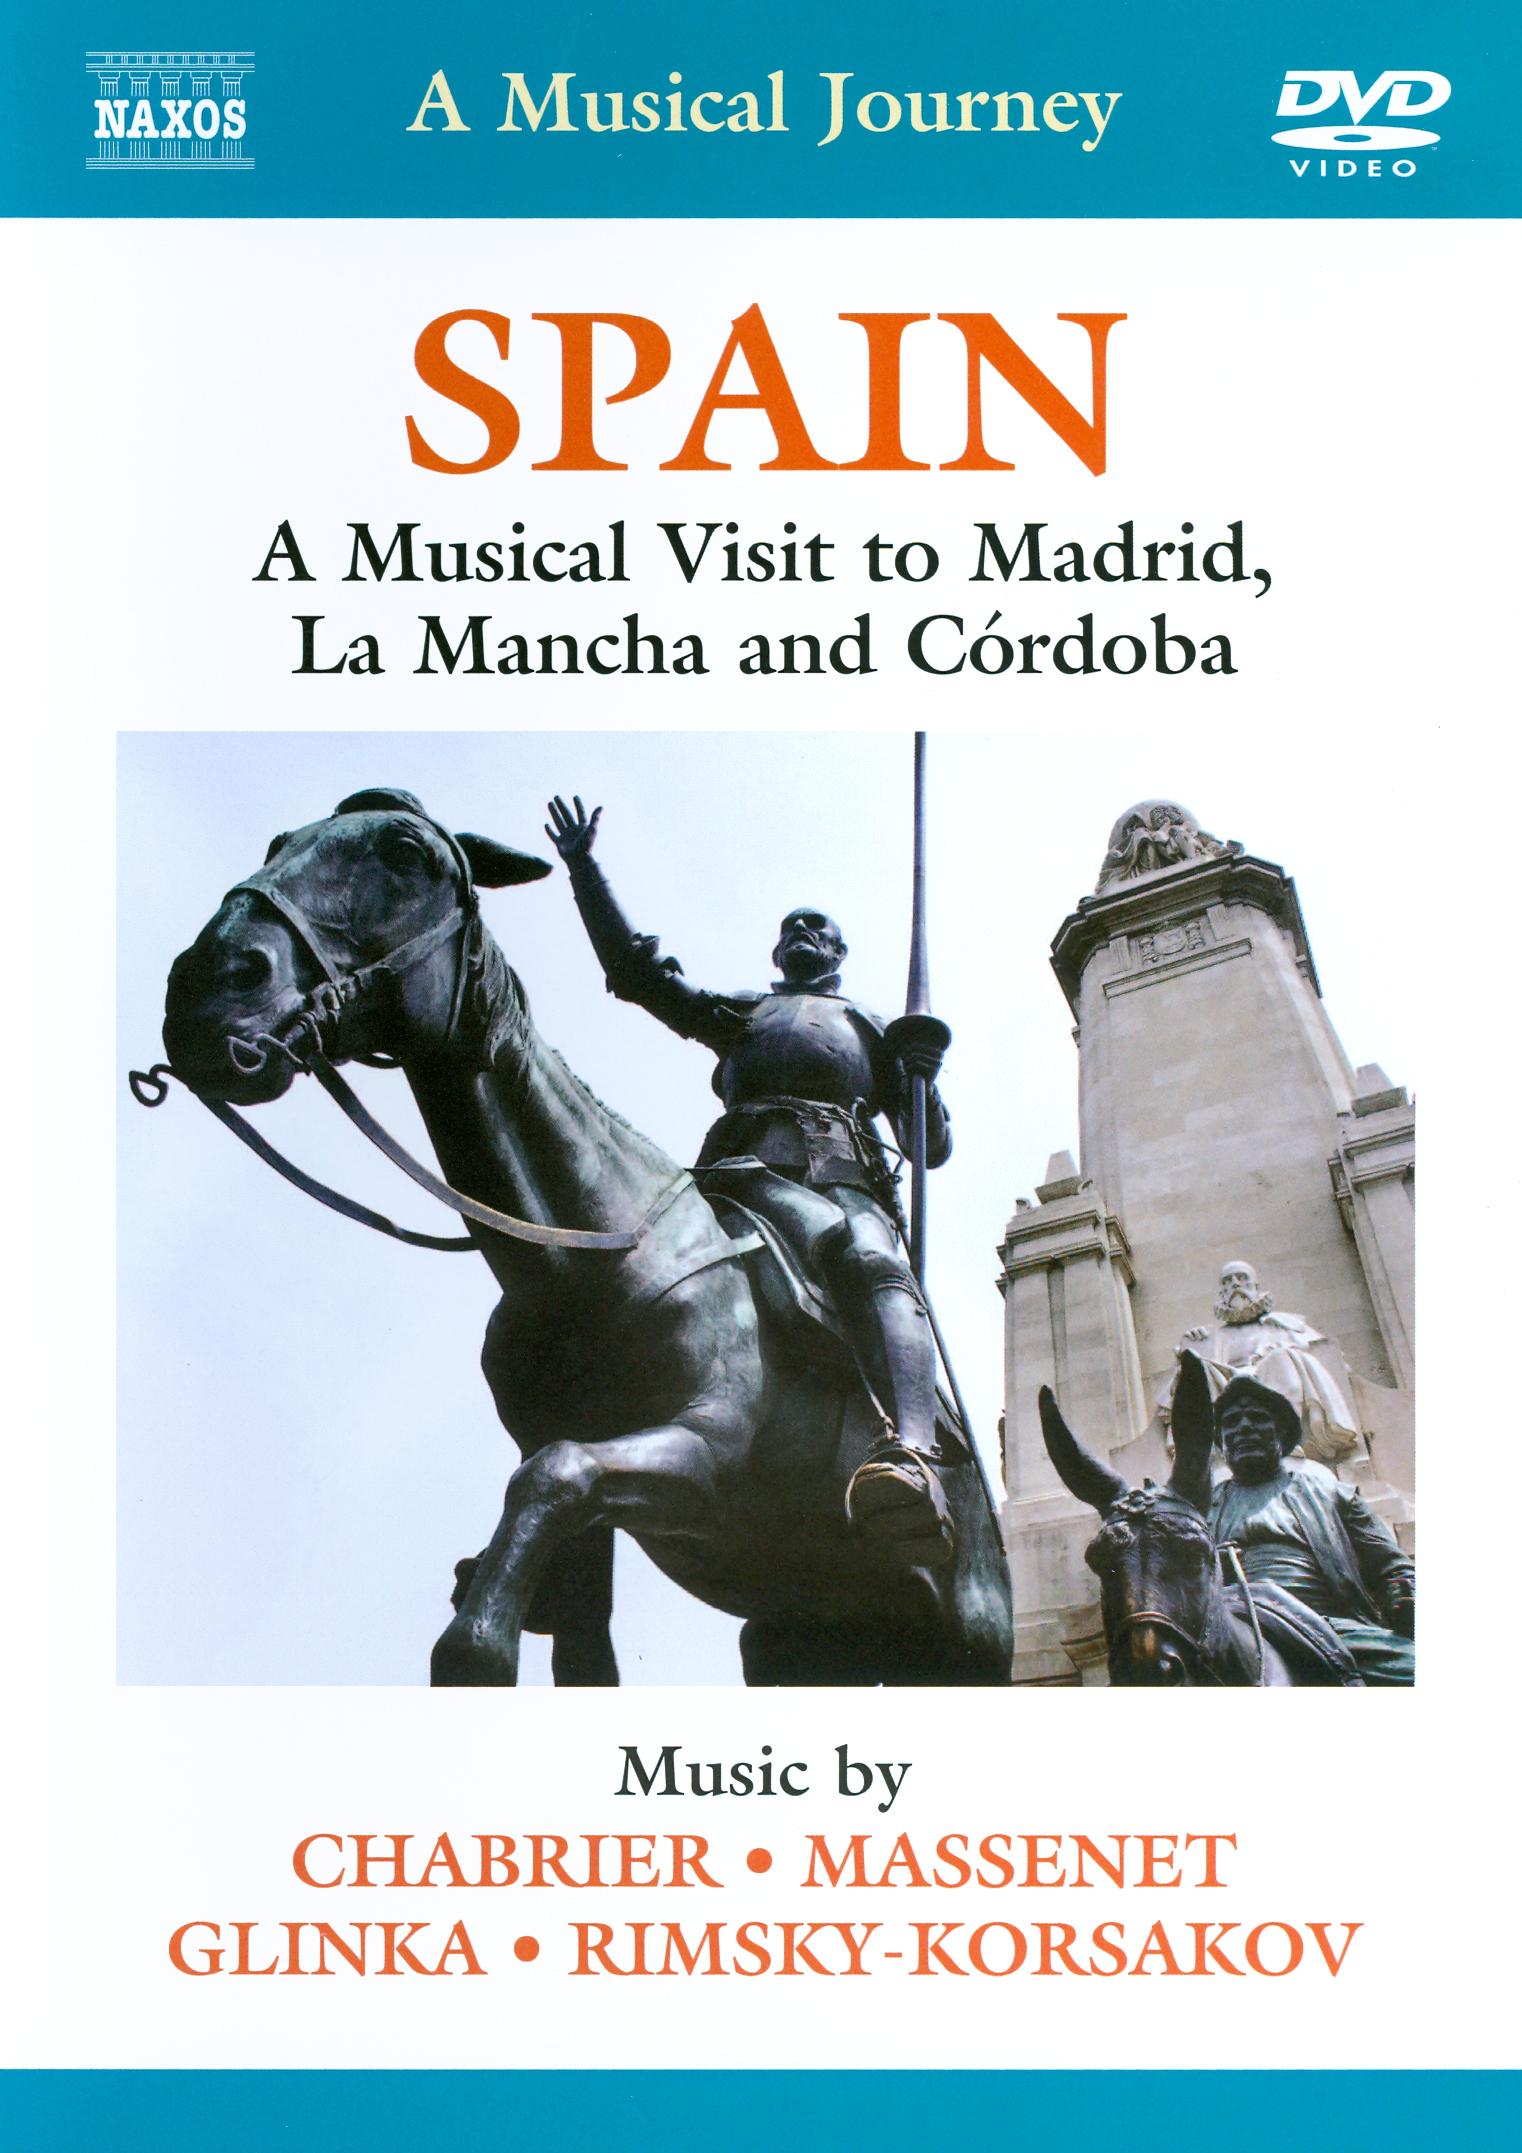 A Musical Journey: Spain - A Musical Visit to Madrid, La Mancha and Córdoba